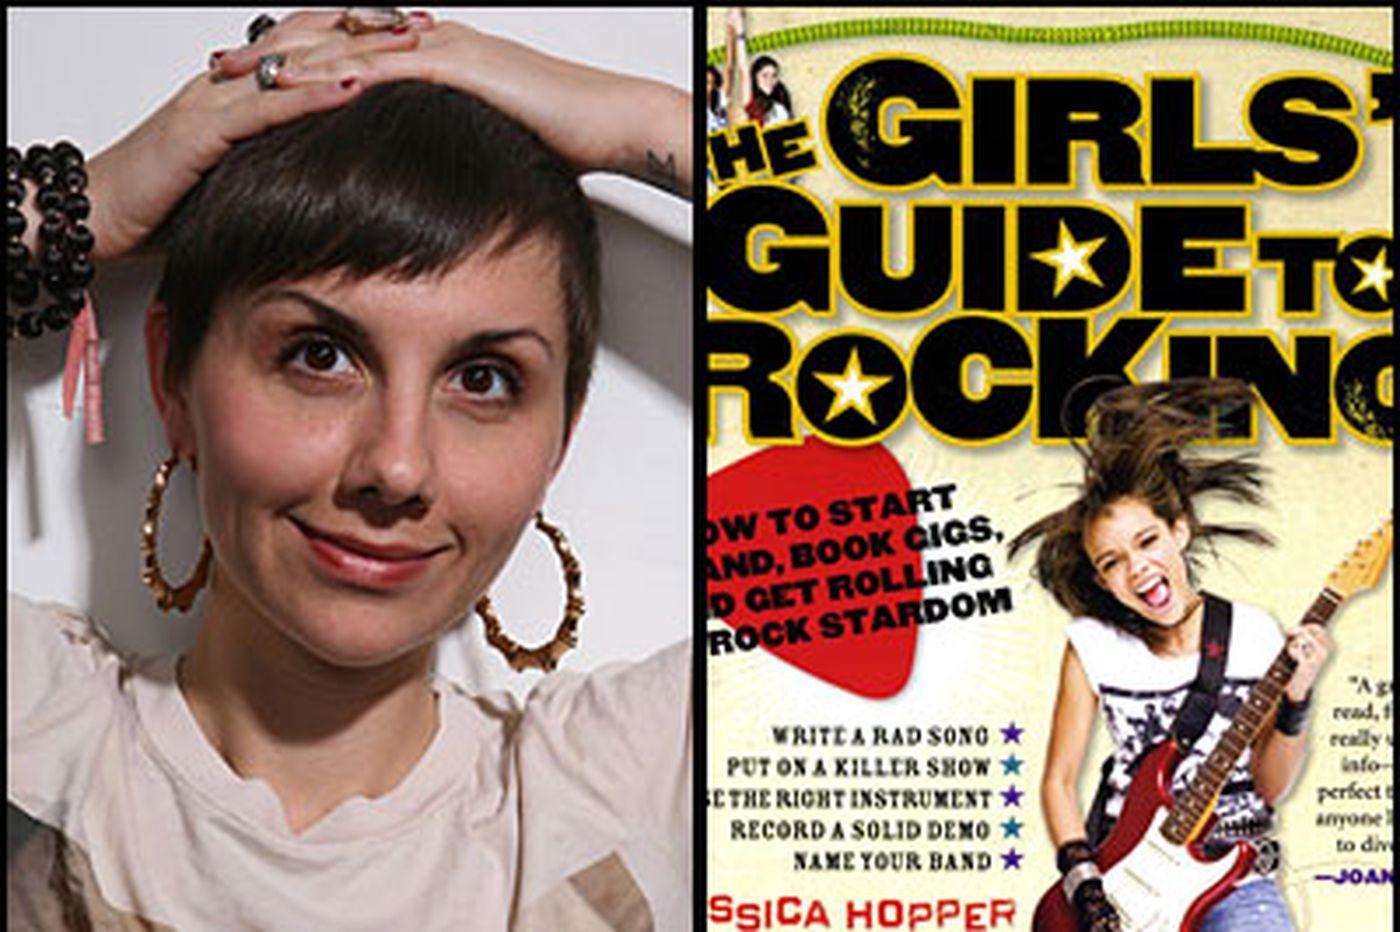 Teaching girls how to rock